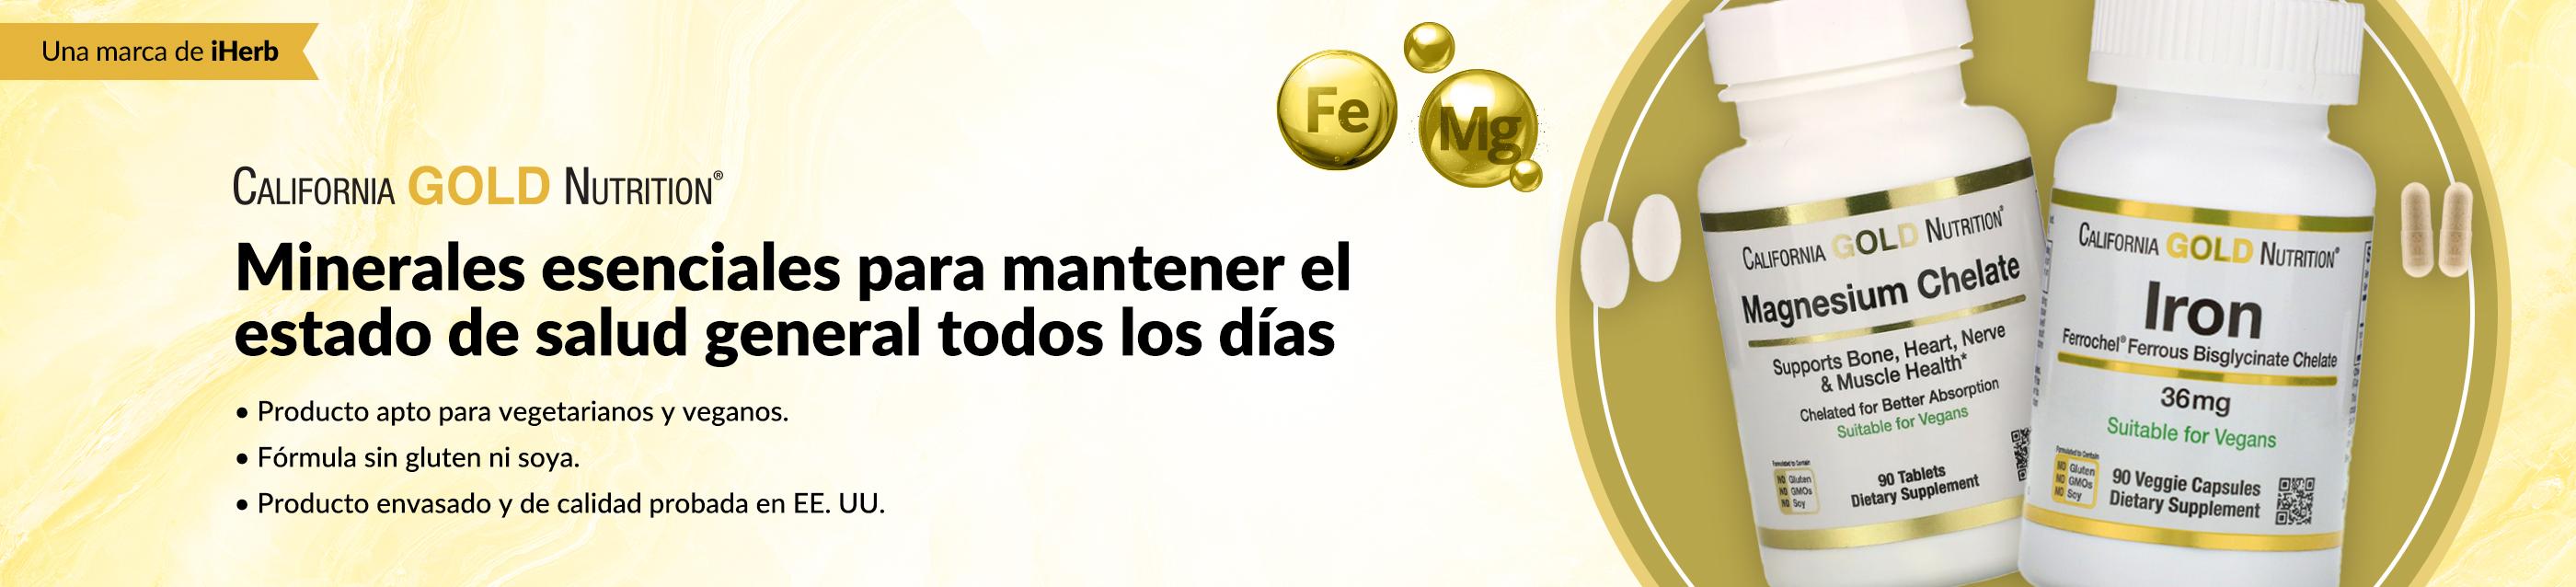 Cgn Minerals